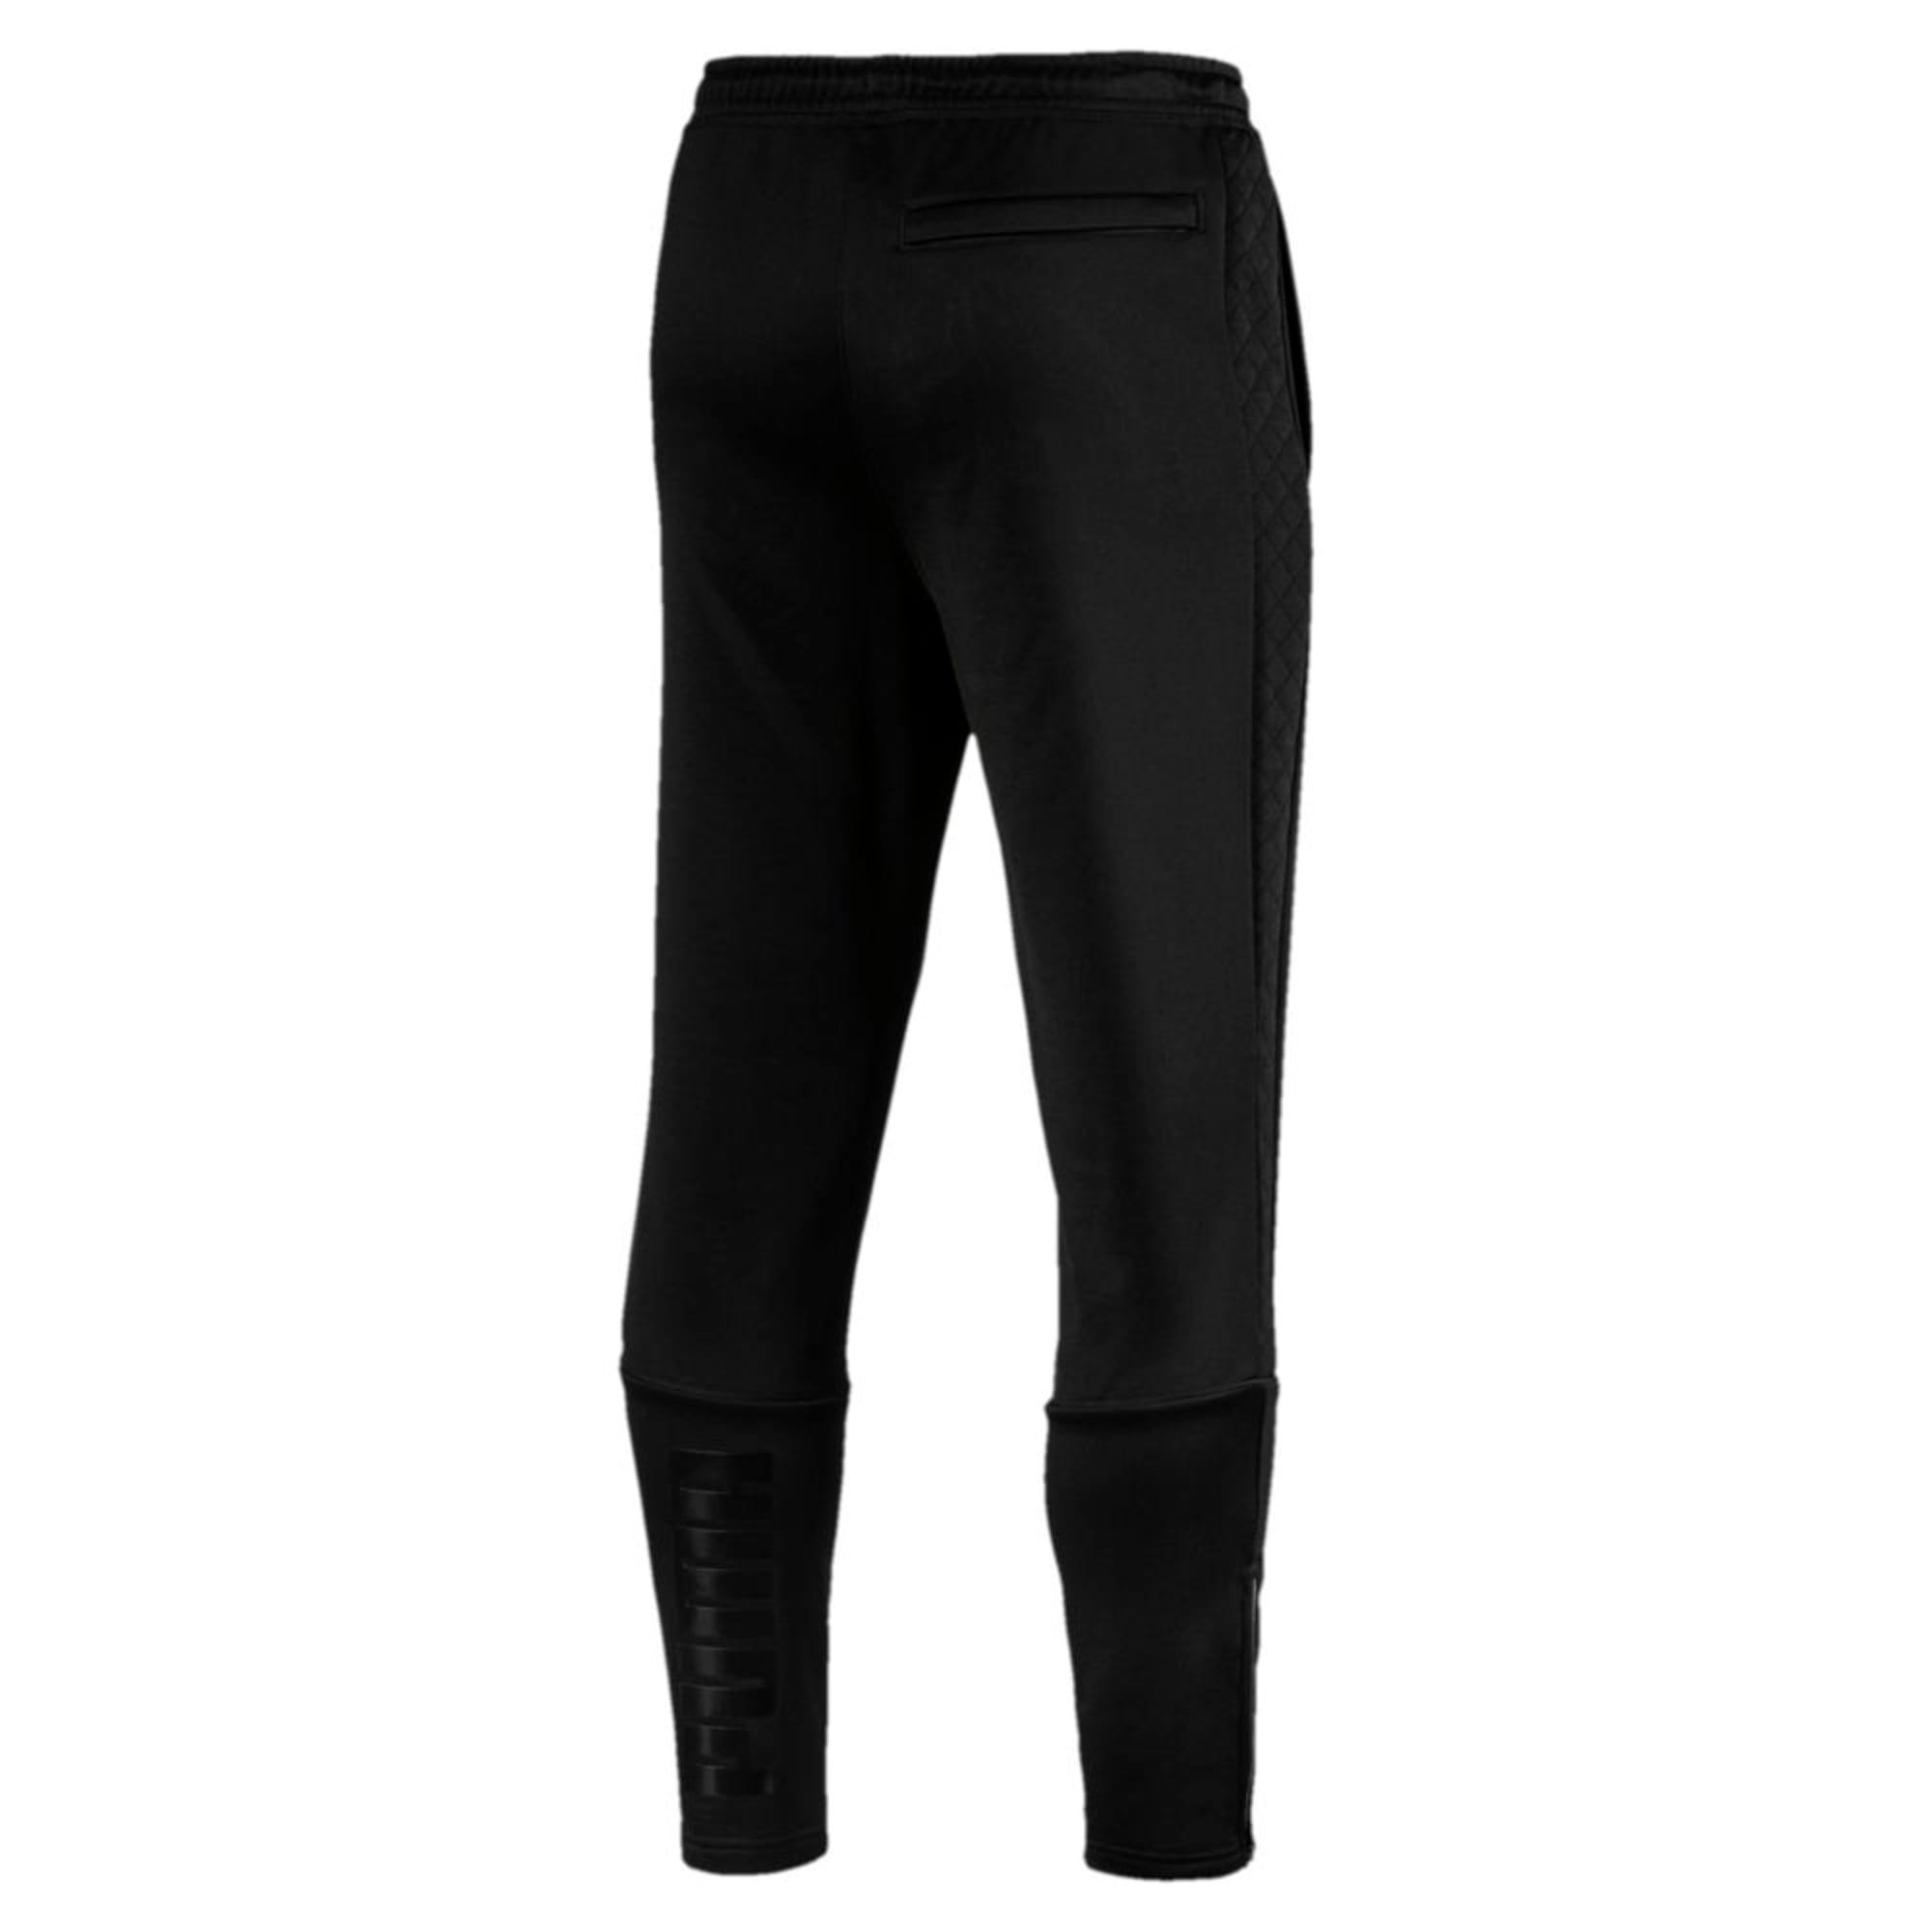 Thumbnail 2 of Archive Retro Quilted Men's Sweatpants, Puma Black, medium-IND